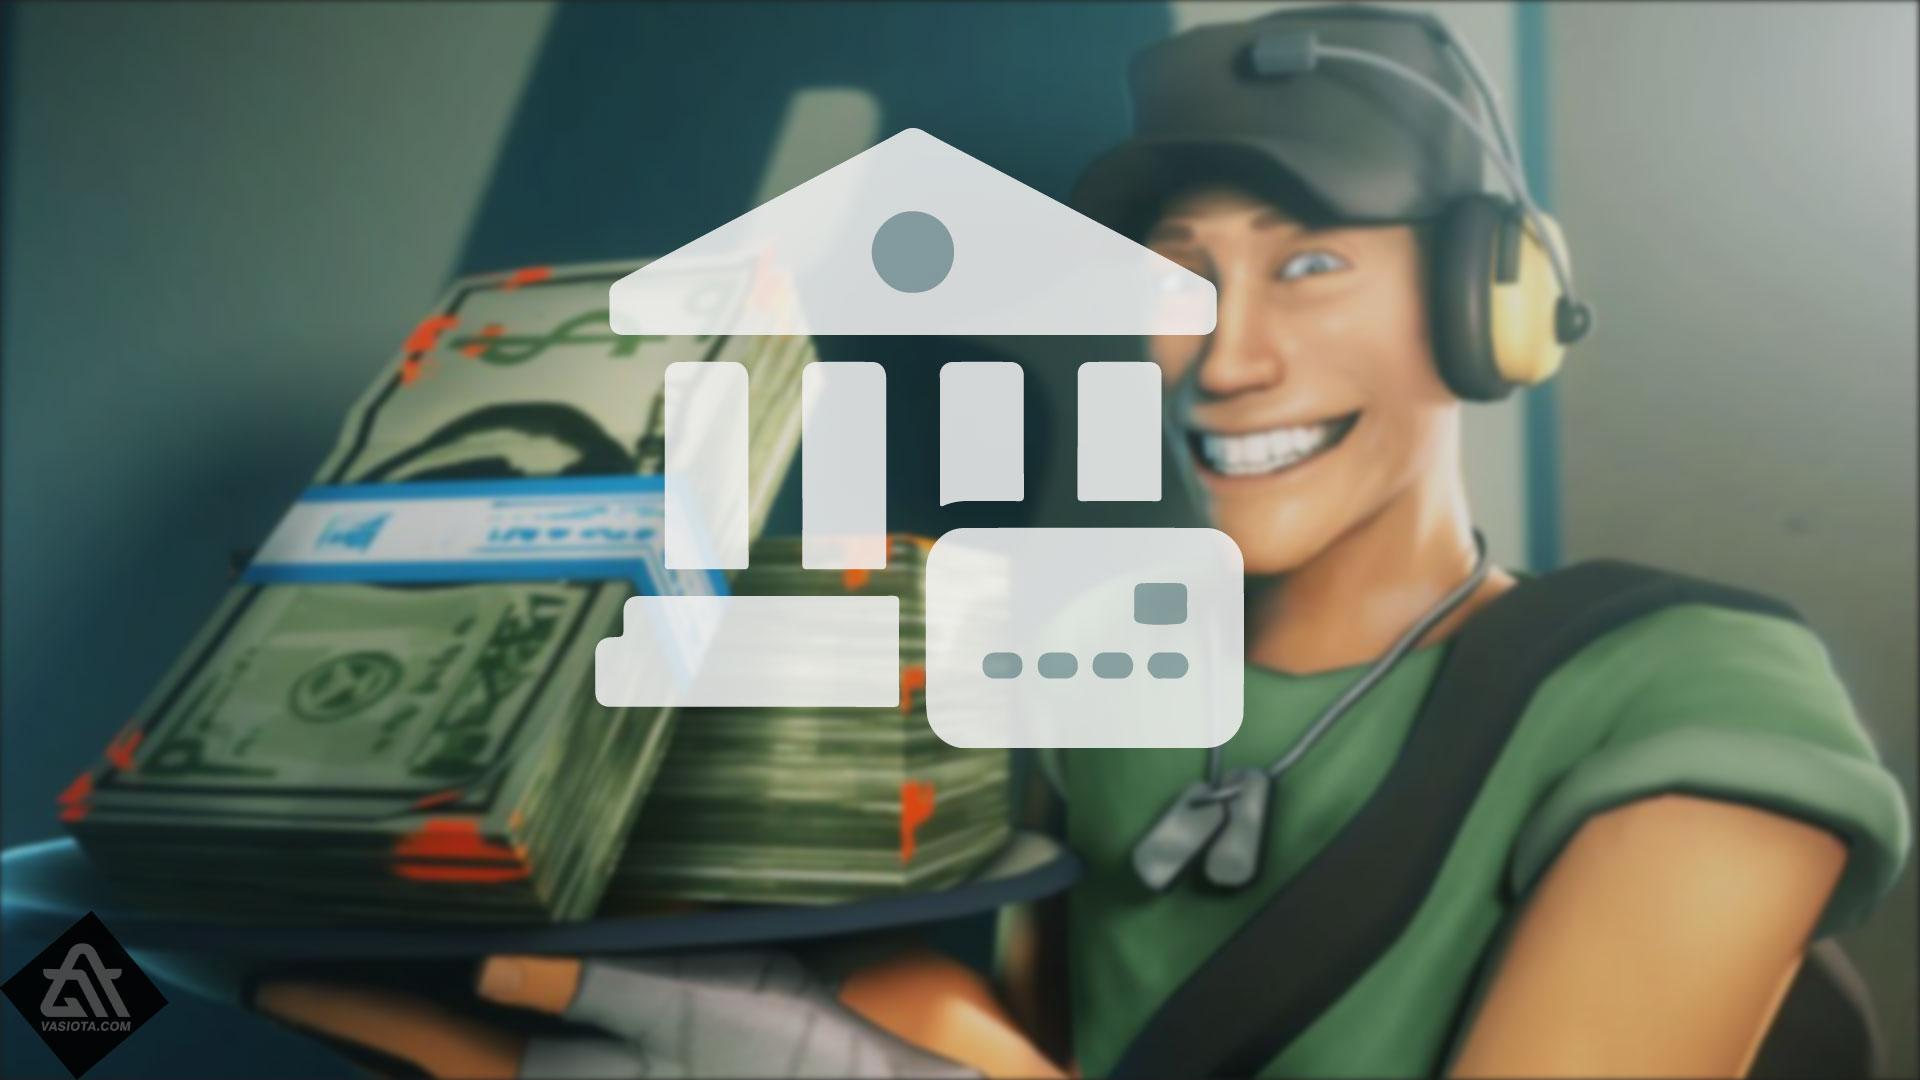 Game Penghasil Uang Langsung ke Rekening Tanpa Modal